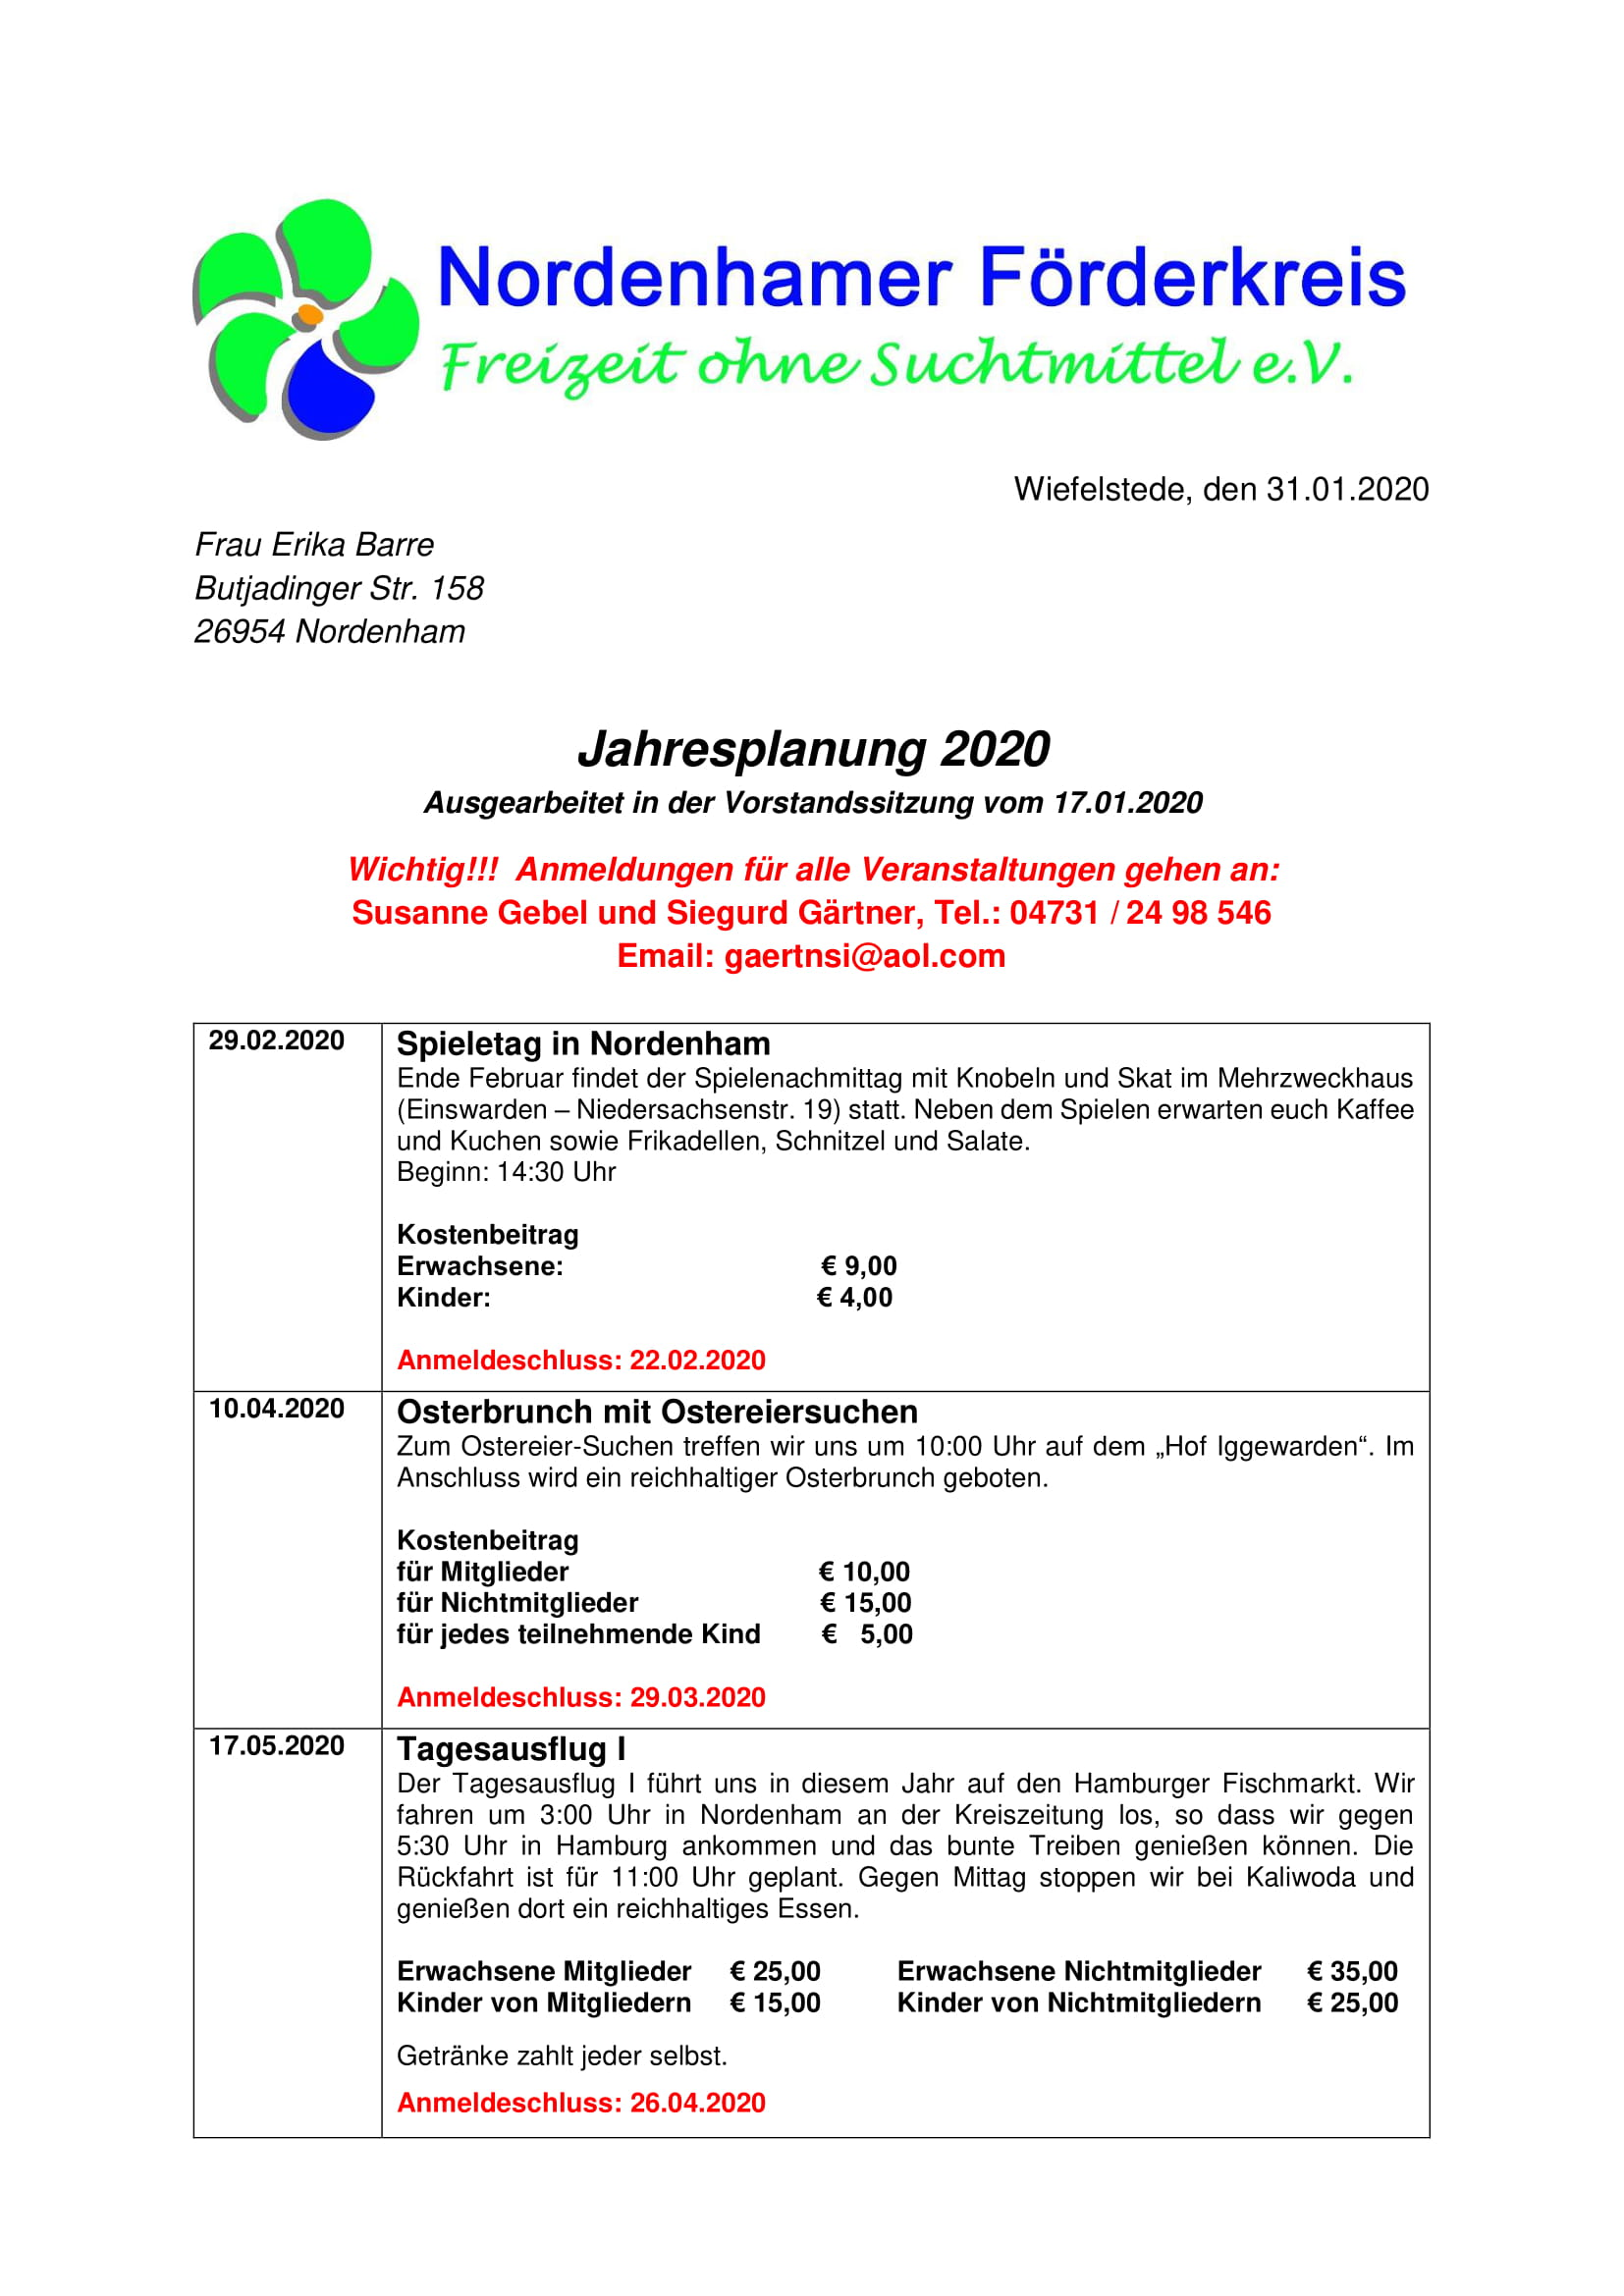 Jahresplanung 2020-1